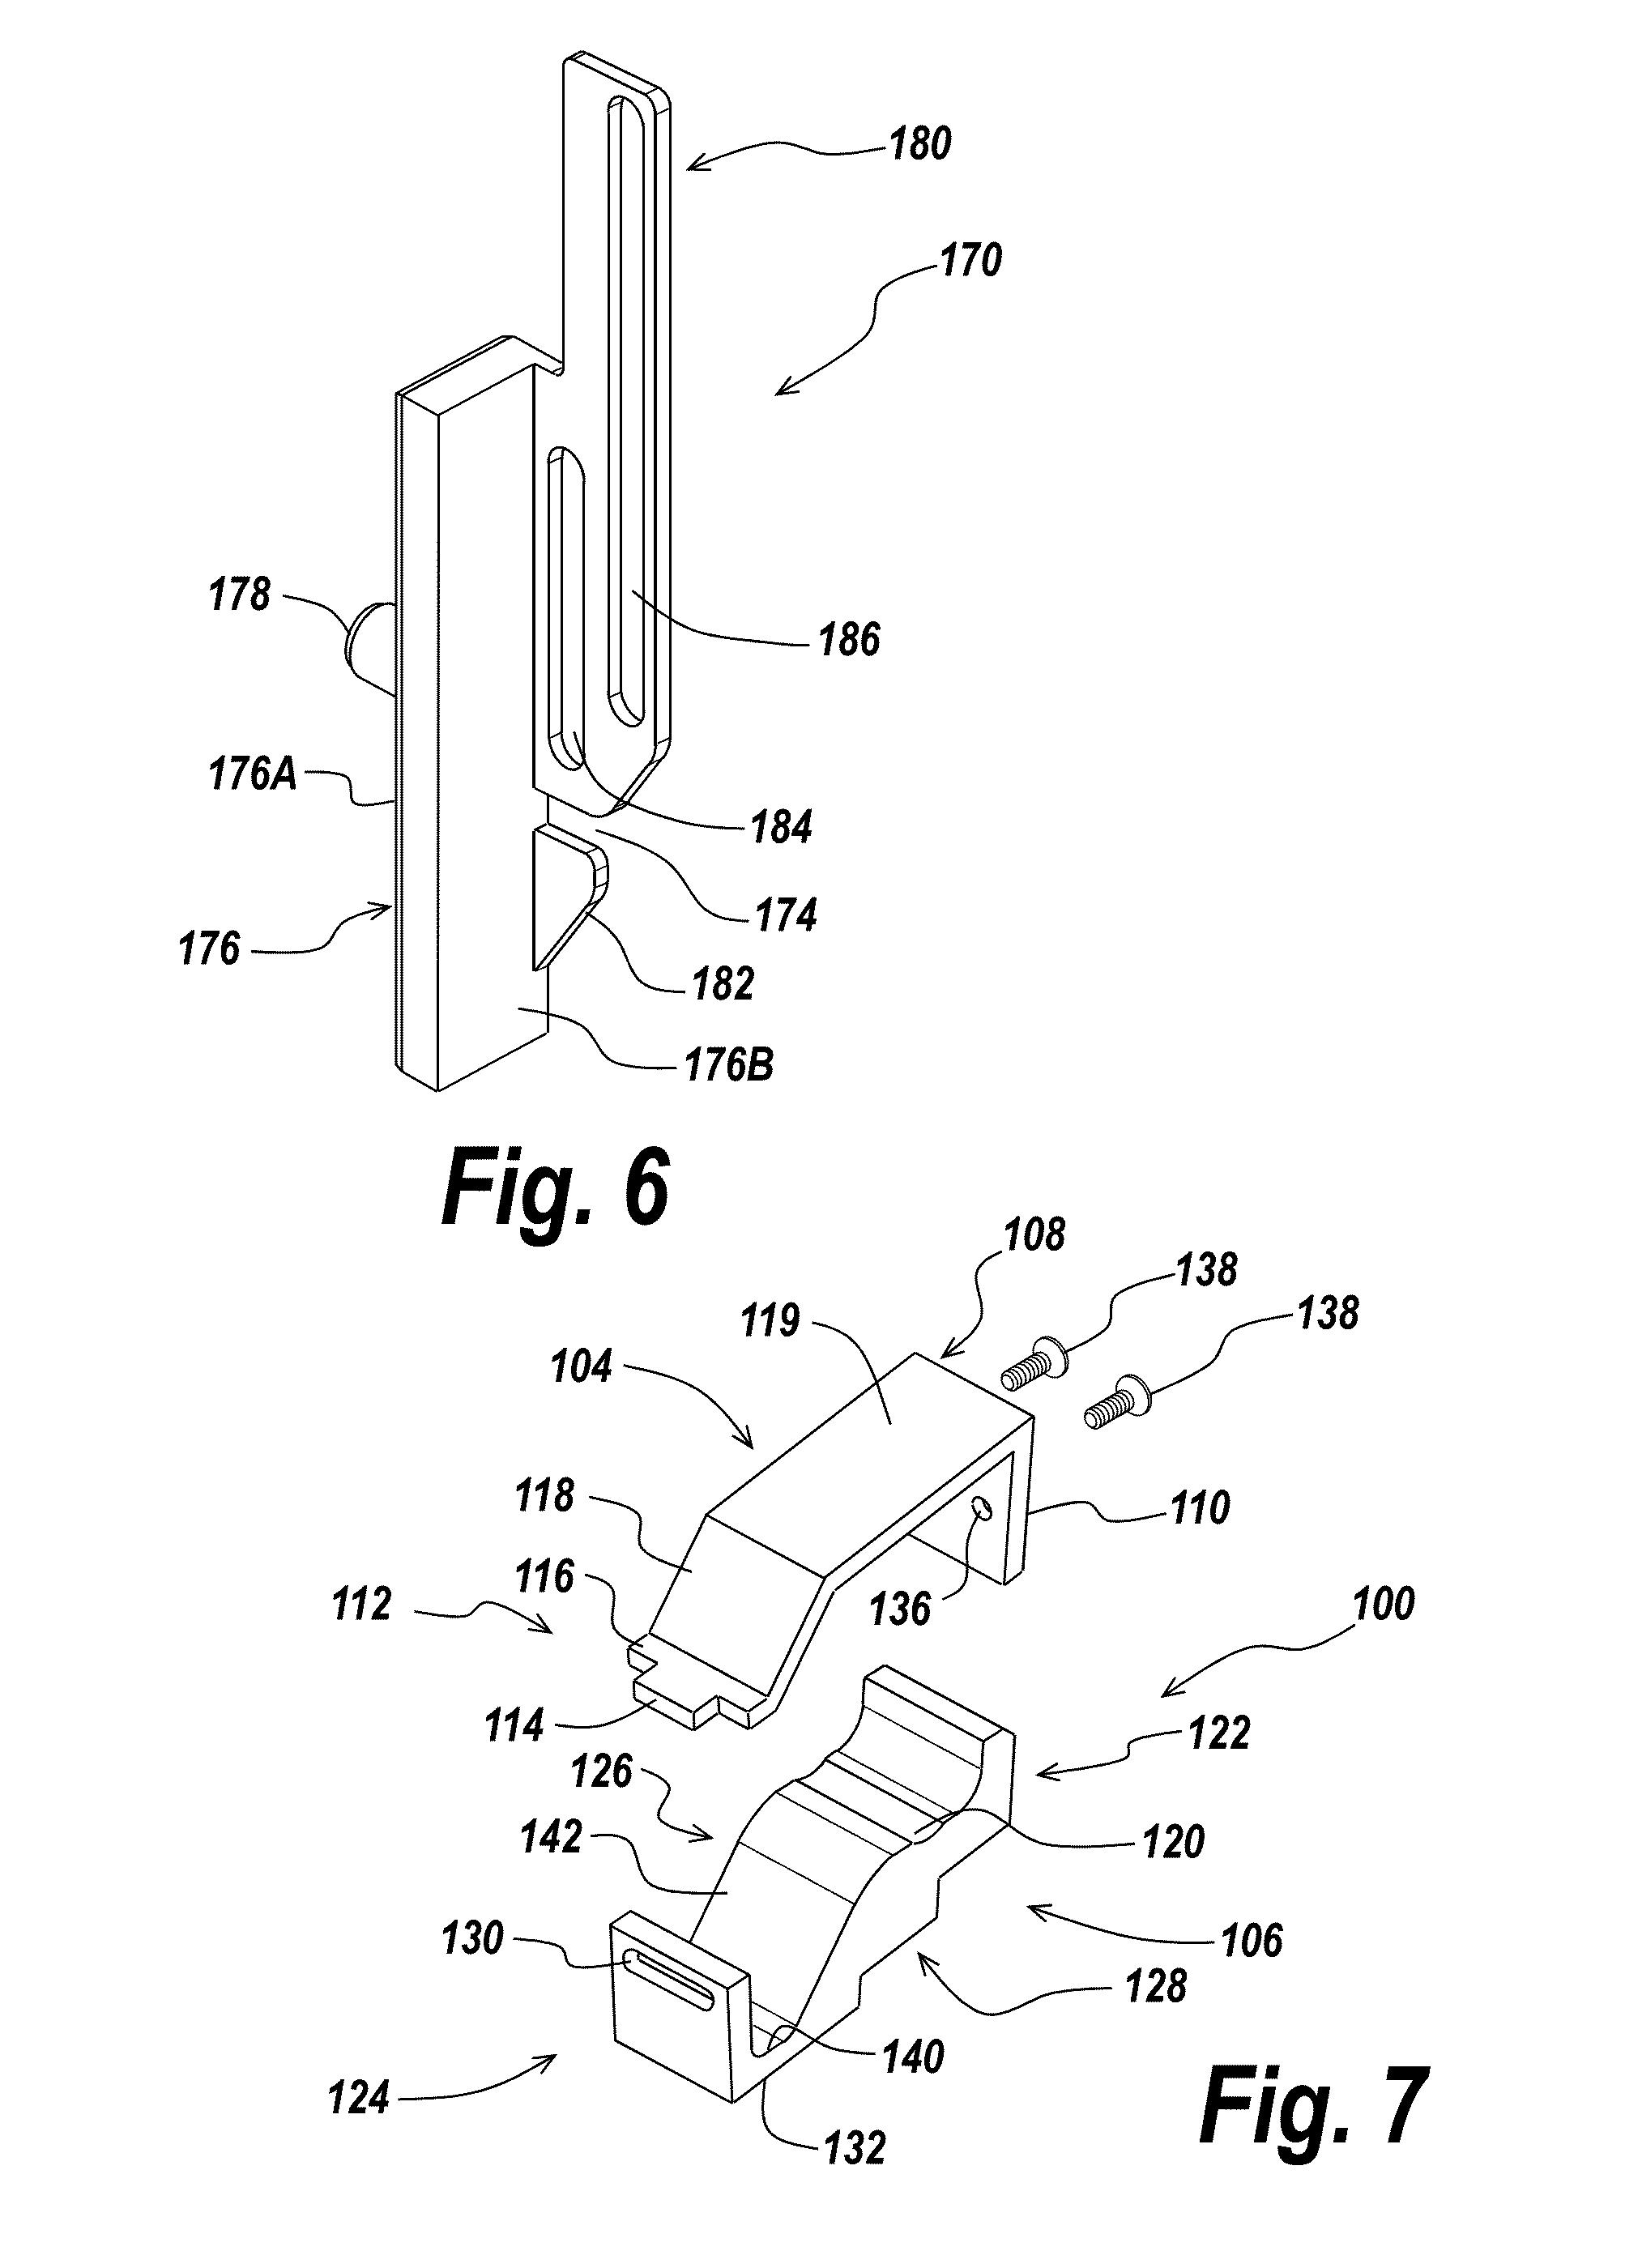 26 Pressure Transducer Wiring Diagram